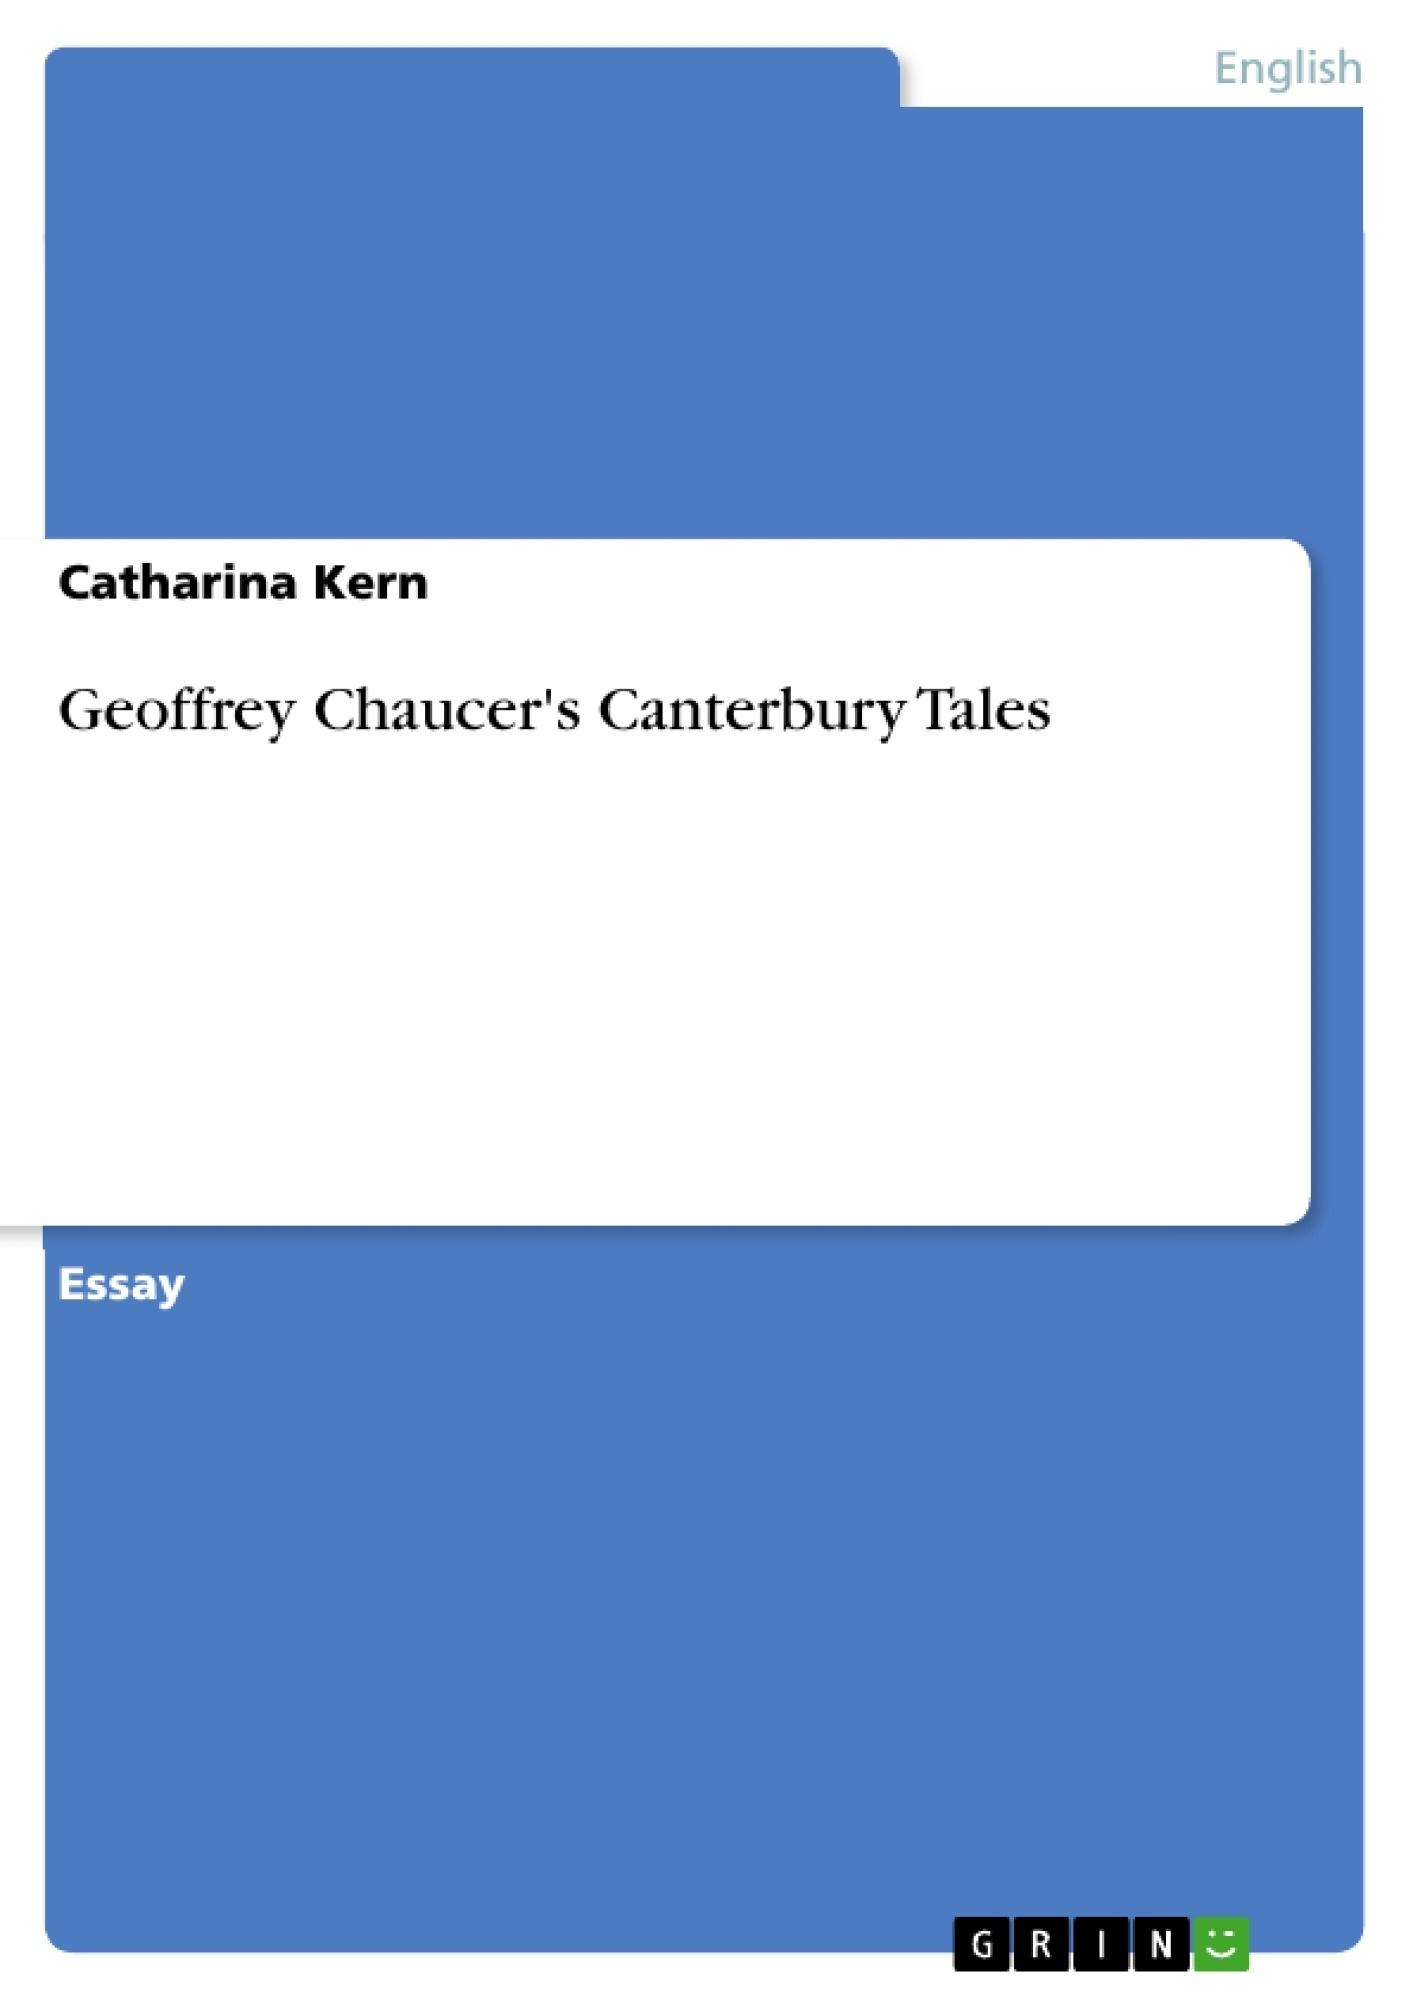 canterbury tales essay ideas